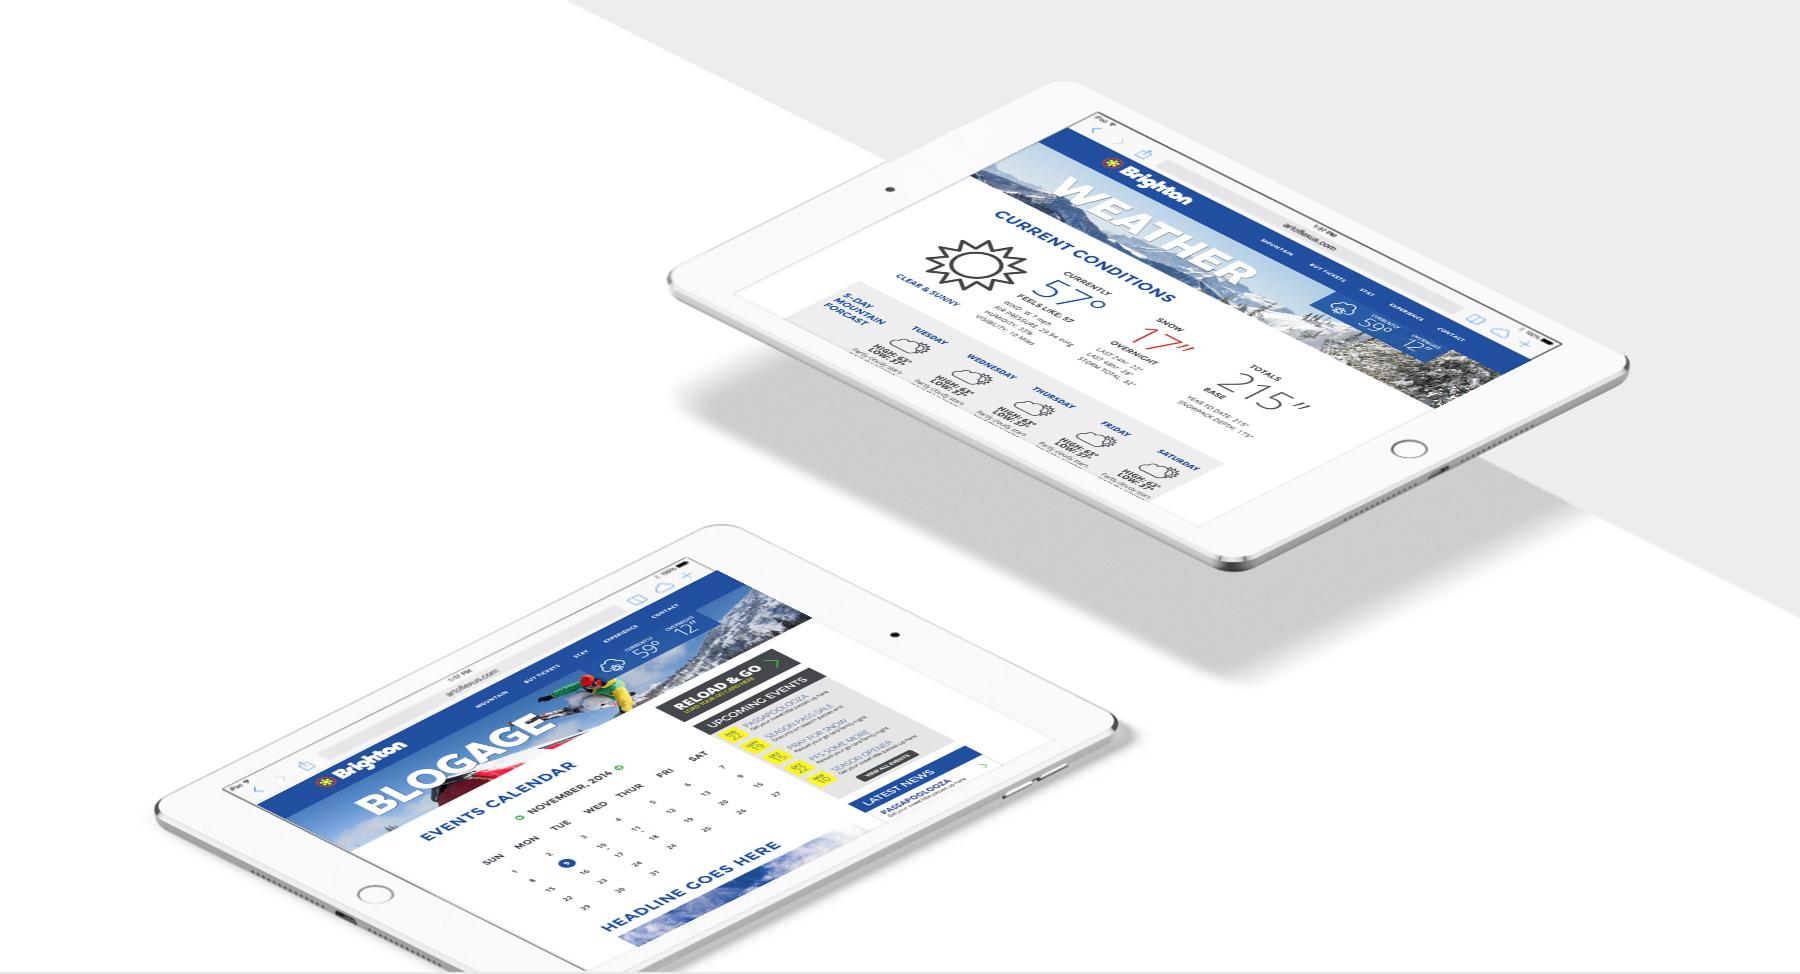 Brighton Ski Resort website screenshot on iPad